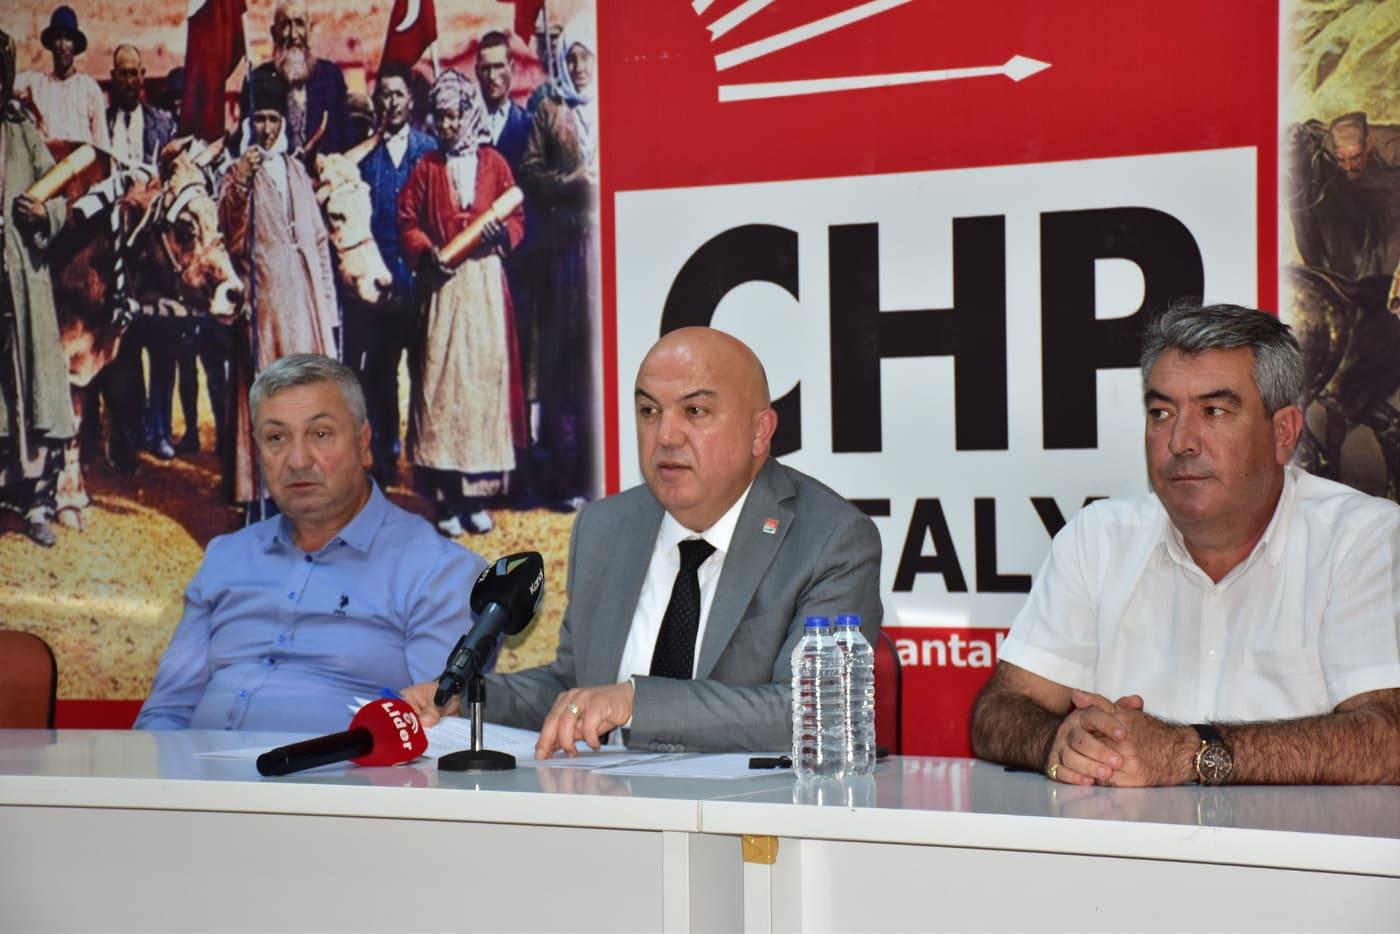 BAŞKAN CENGİZ'DEN AKP'Lİ TAŞ'A YANIT GECİKMEDİ...